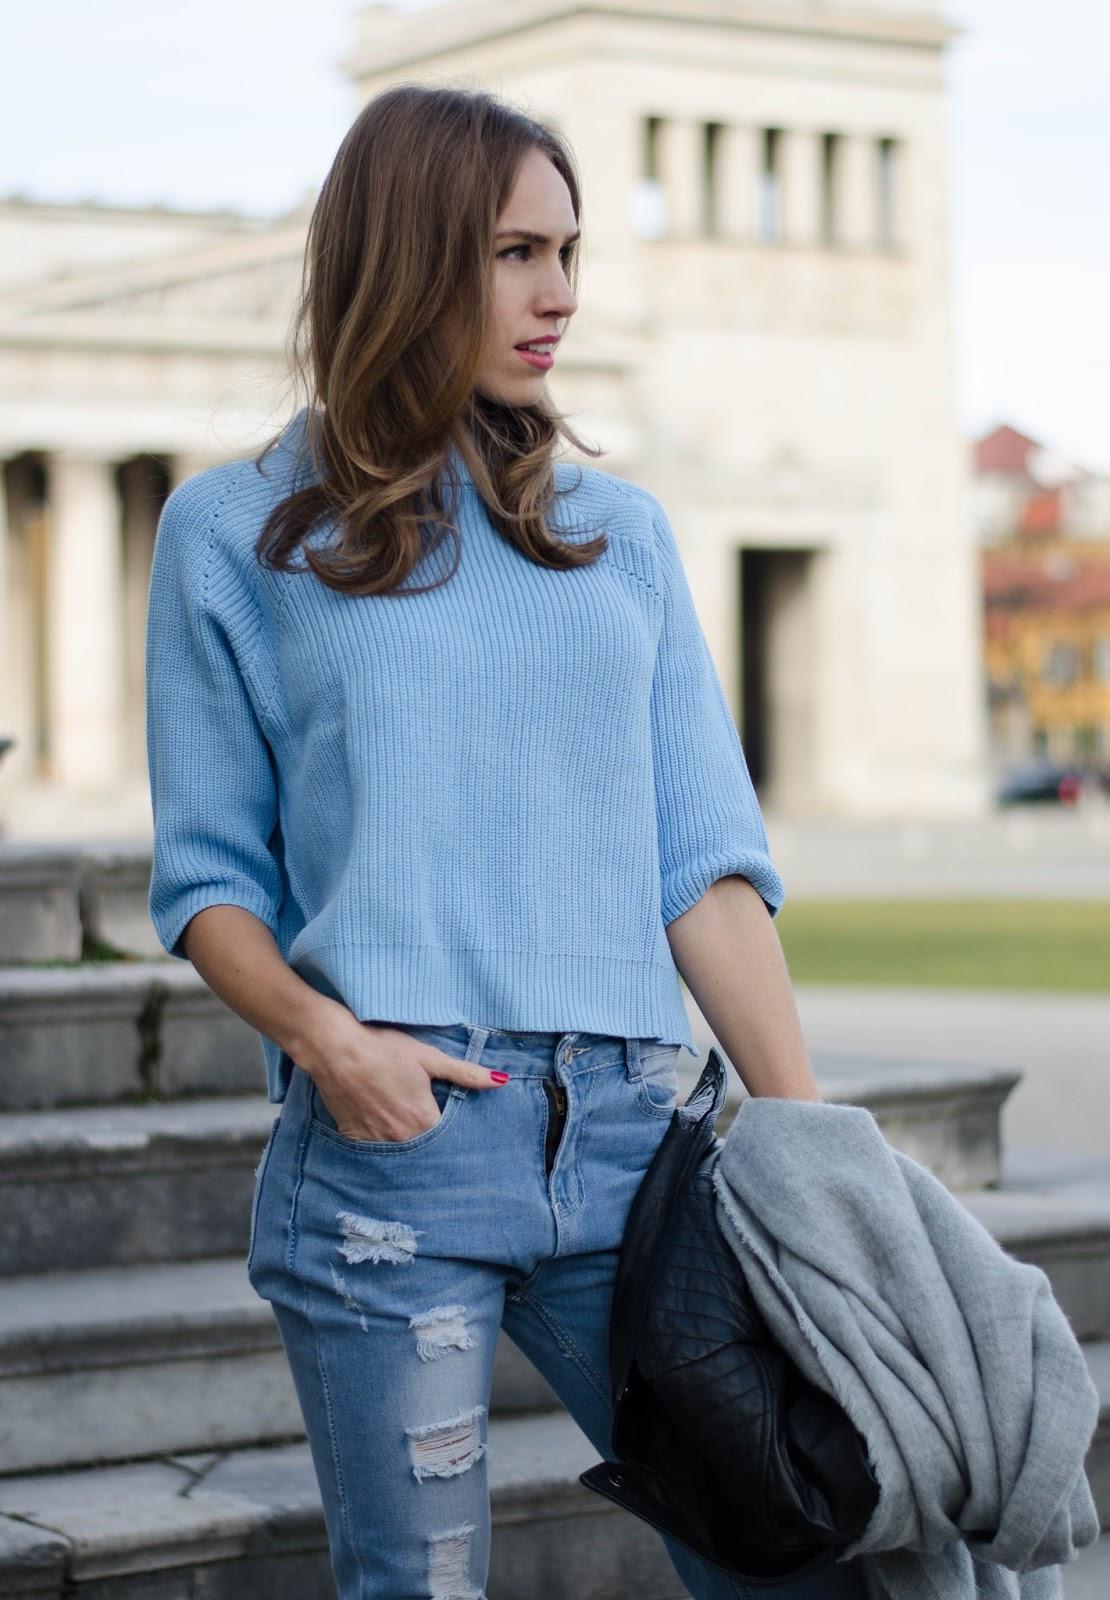 kristjaana mere knitted sweater top ripped boyfriend jeans